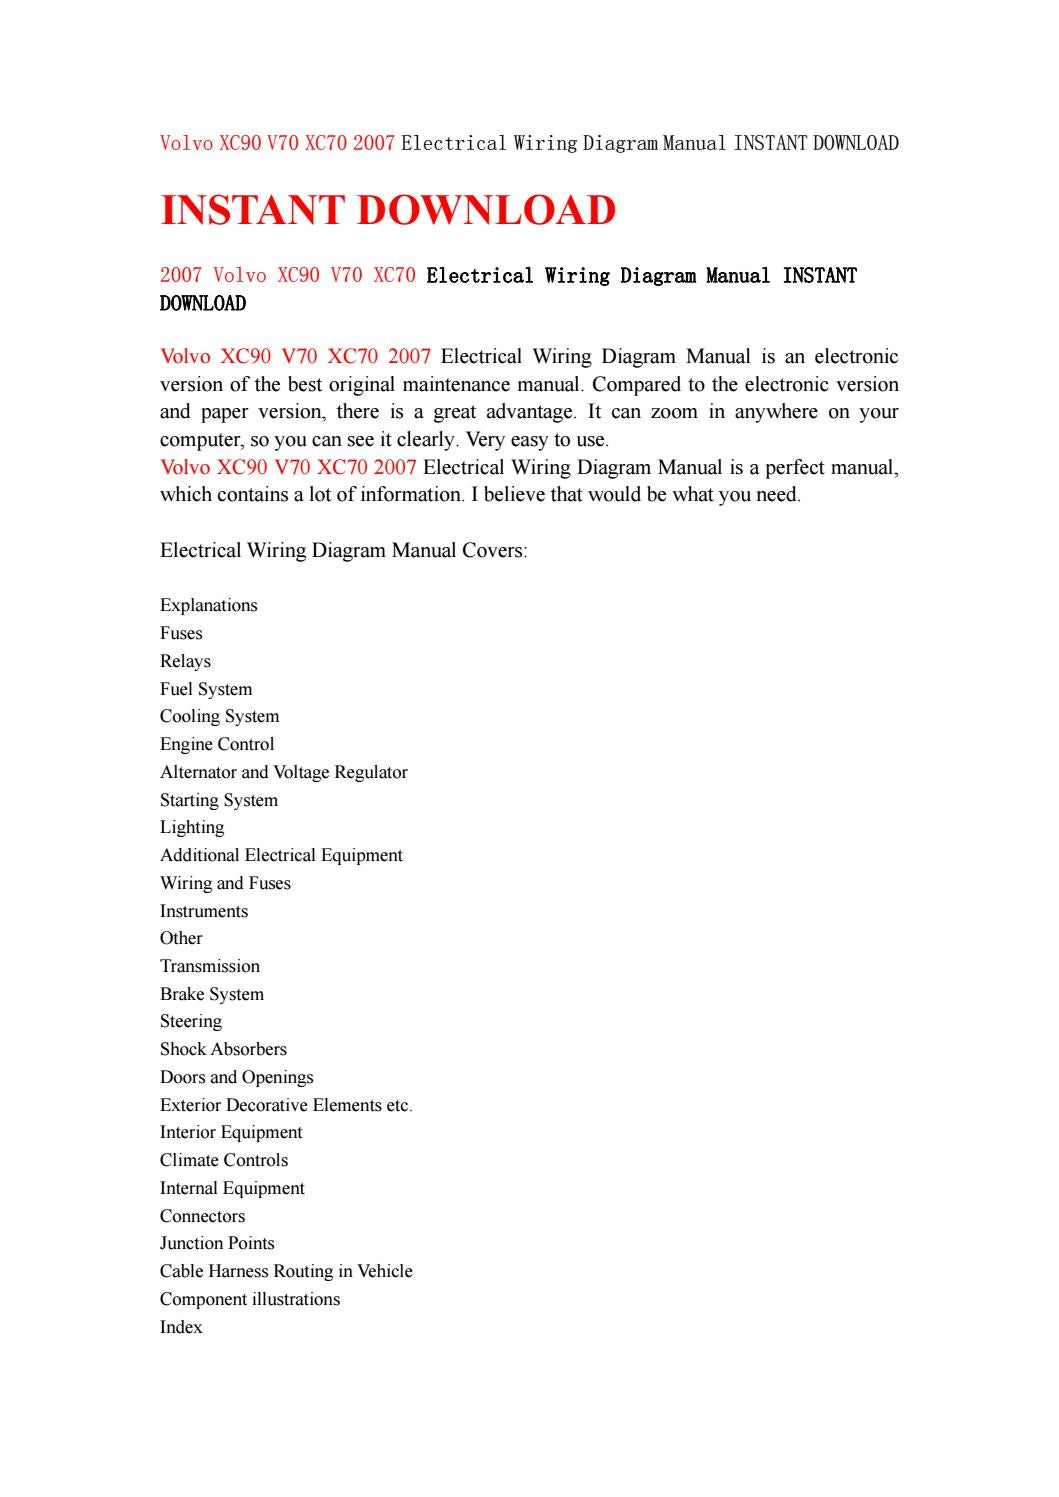 Volvo Xc90 V70 Xc70 2007 Electrical Wiring Diagram Manual Instant Download By Kfjsjfnsef